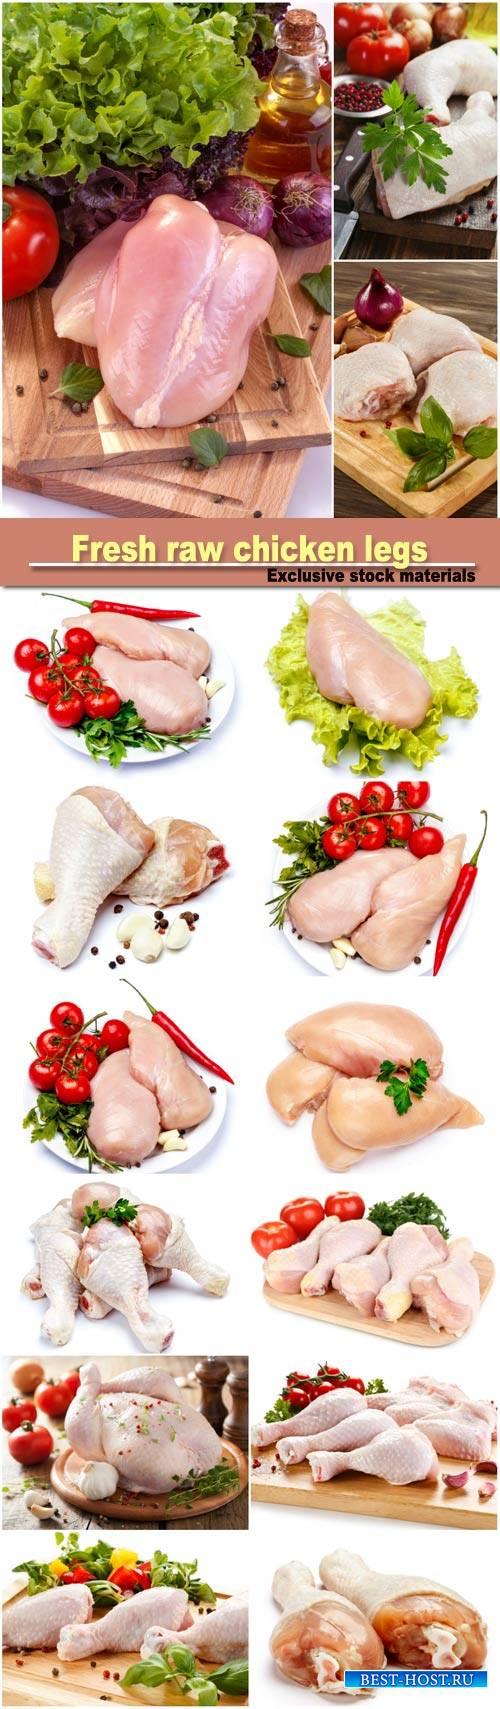 Raw chicken breast fillets, fresh raw chicken legs on the cutting board